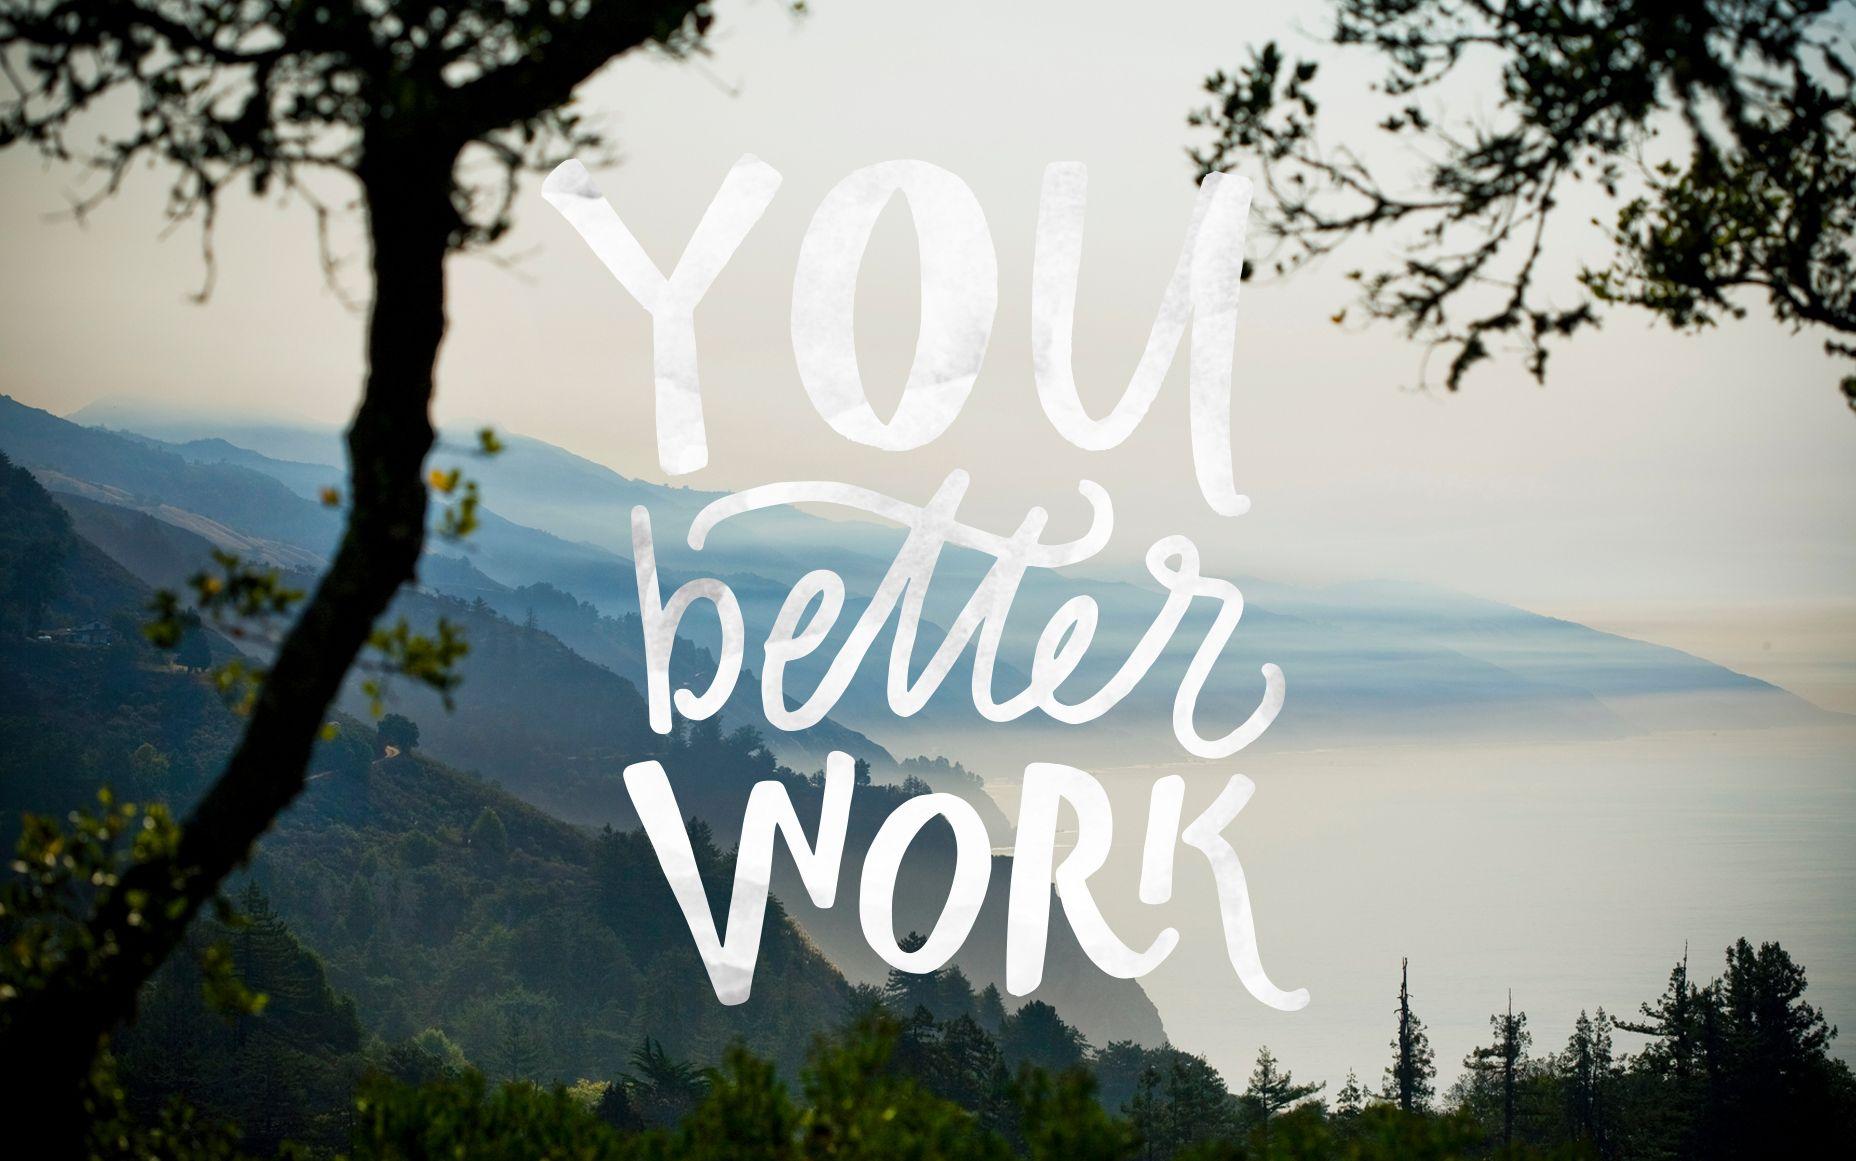 Bible Quote Wallpapers Mac January Wallpaper Backgrounds Desktop Wallpaper